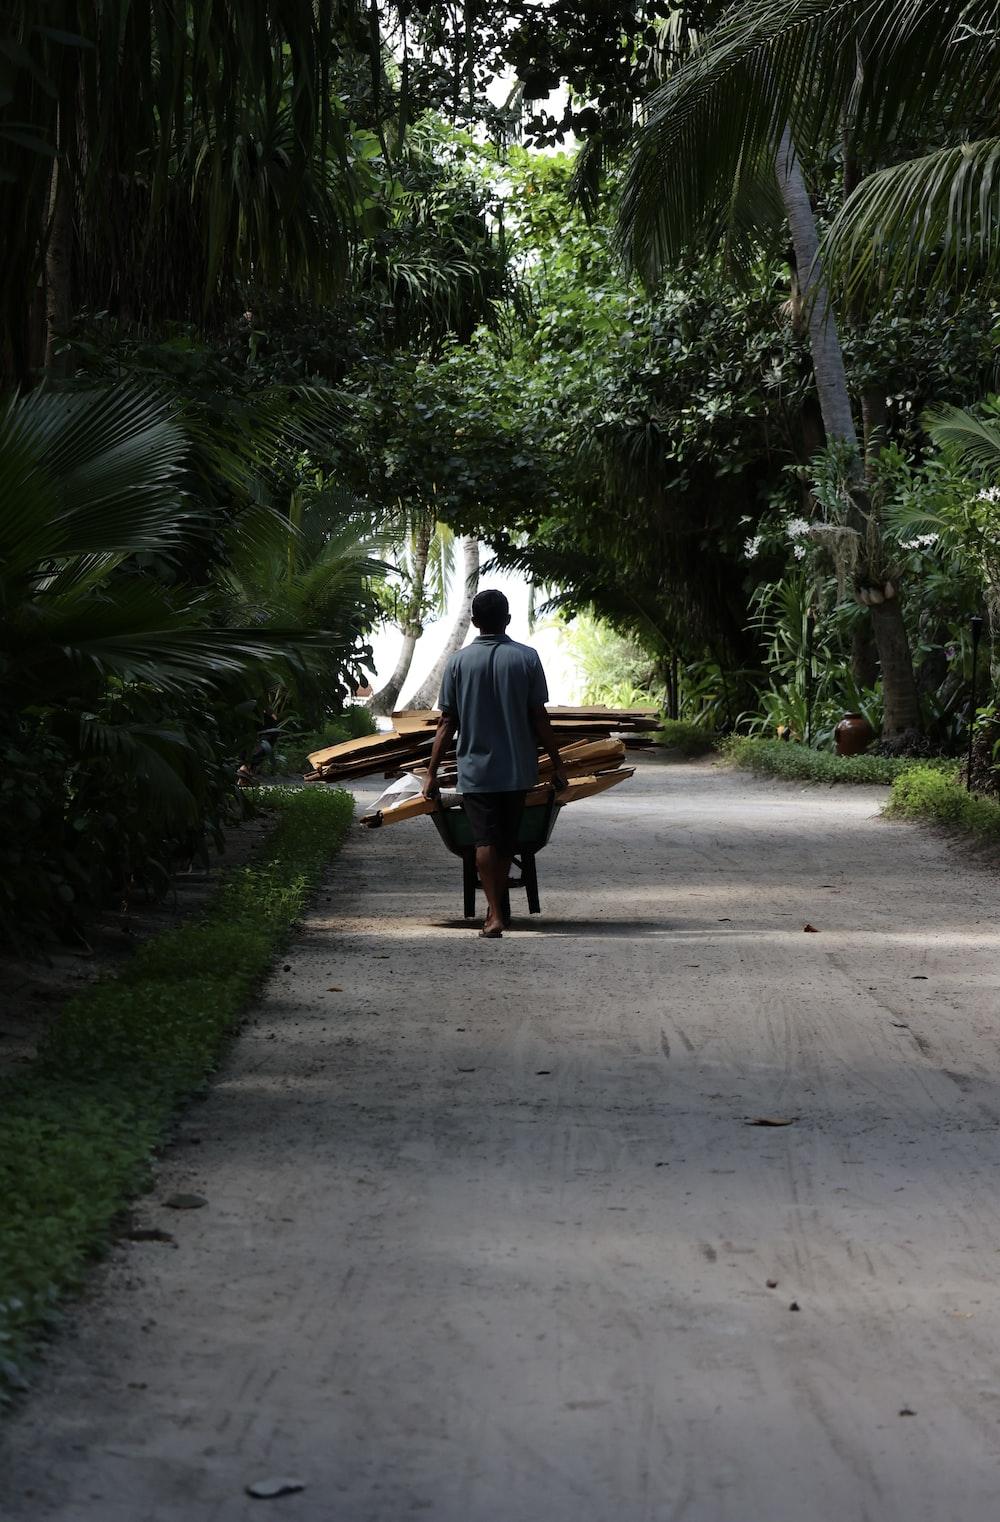 man in white shirt sitting on bench near palm trees during daytime